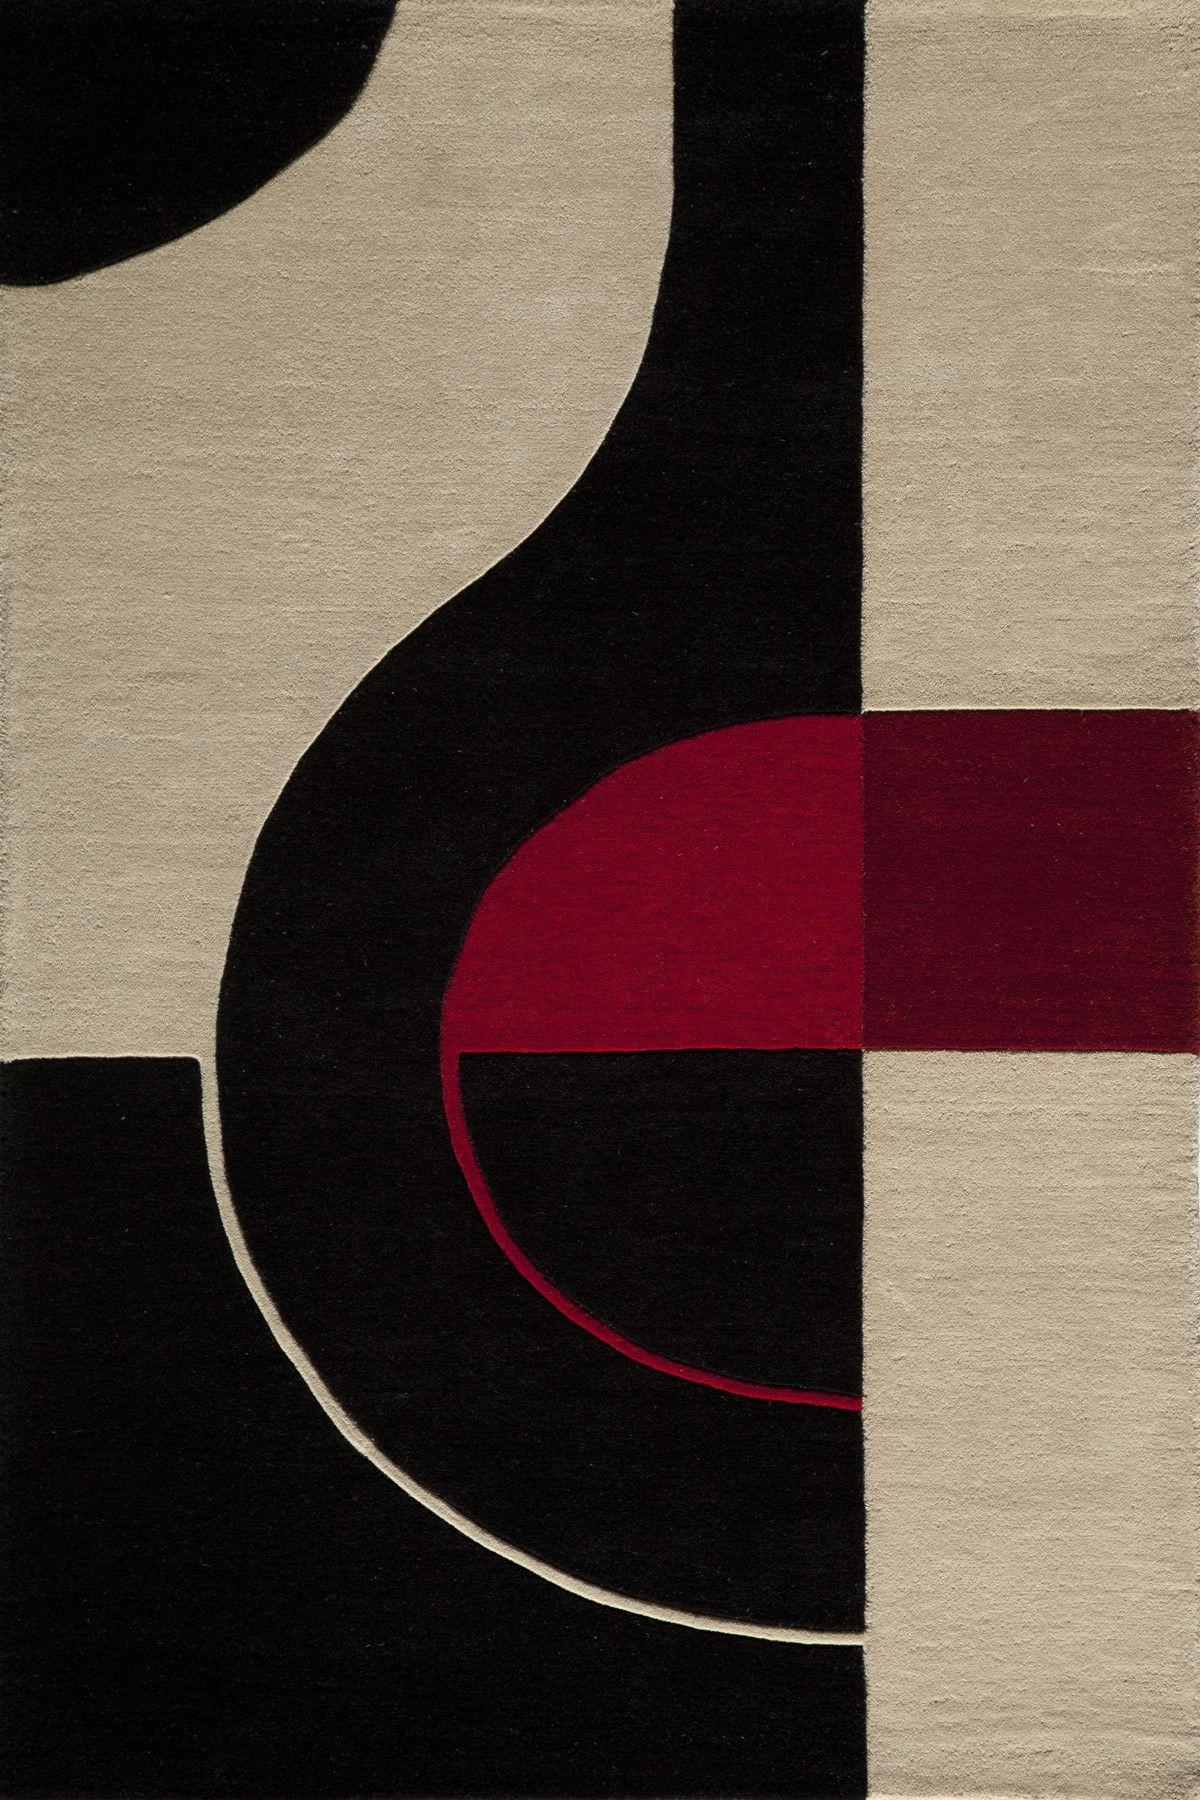 Miller Hand Tufted Wool Black Red Area Rug In 2020 Black Area Rugs Black Rug Momeni Rugs